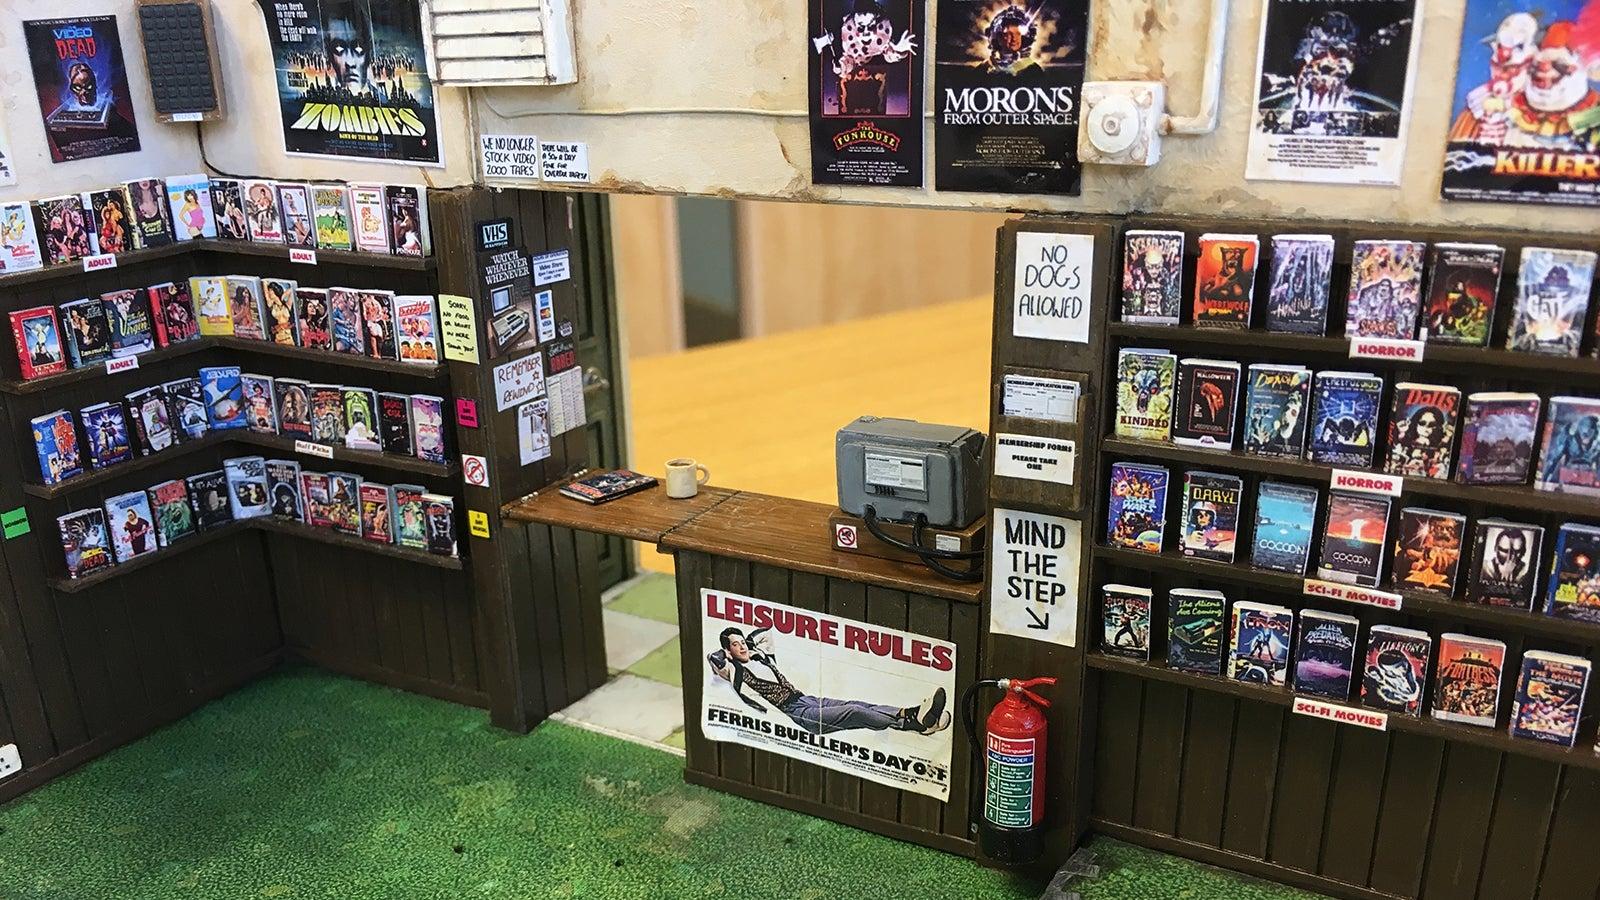 This Tiny Replica Video Store Offers Tiny '90s Nostalgia